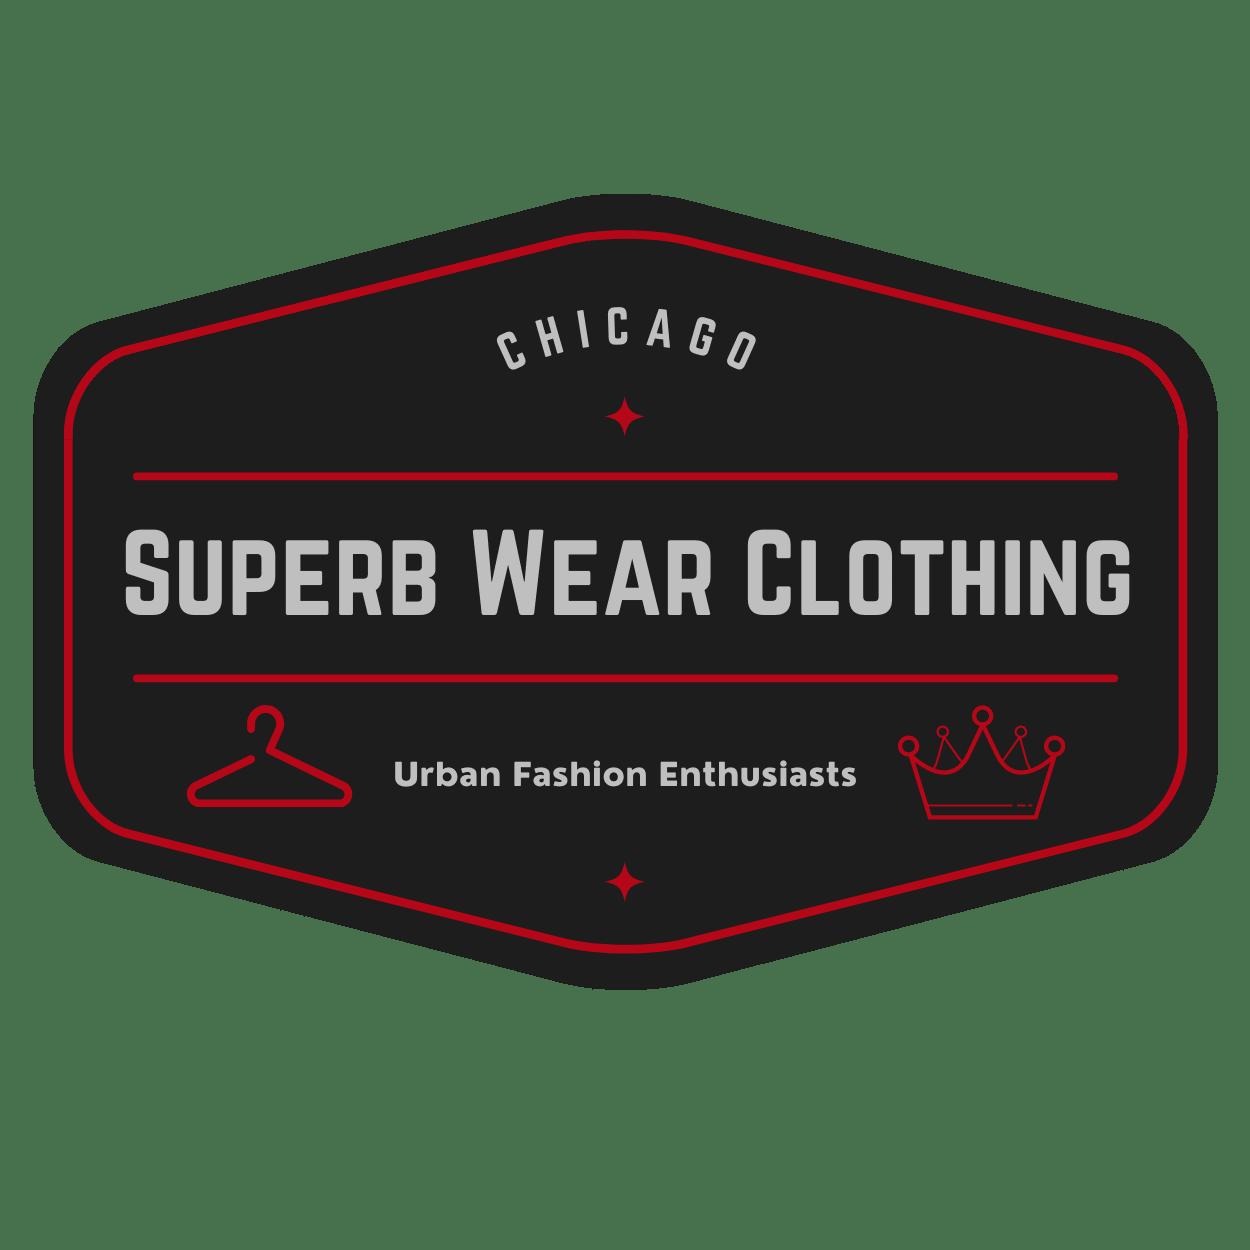 Superb Wear Clothing